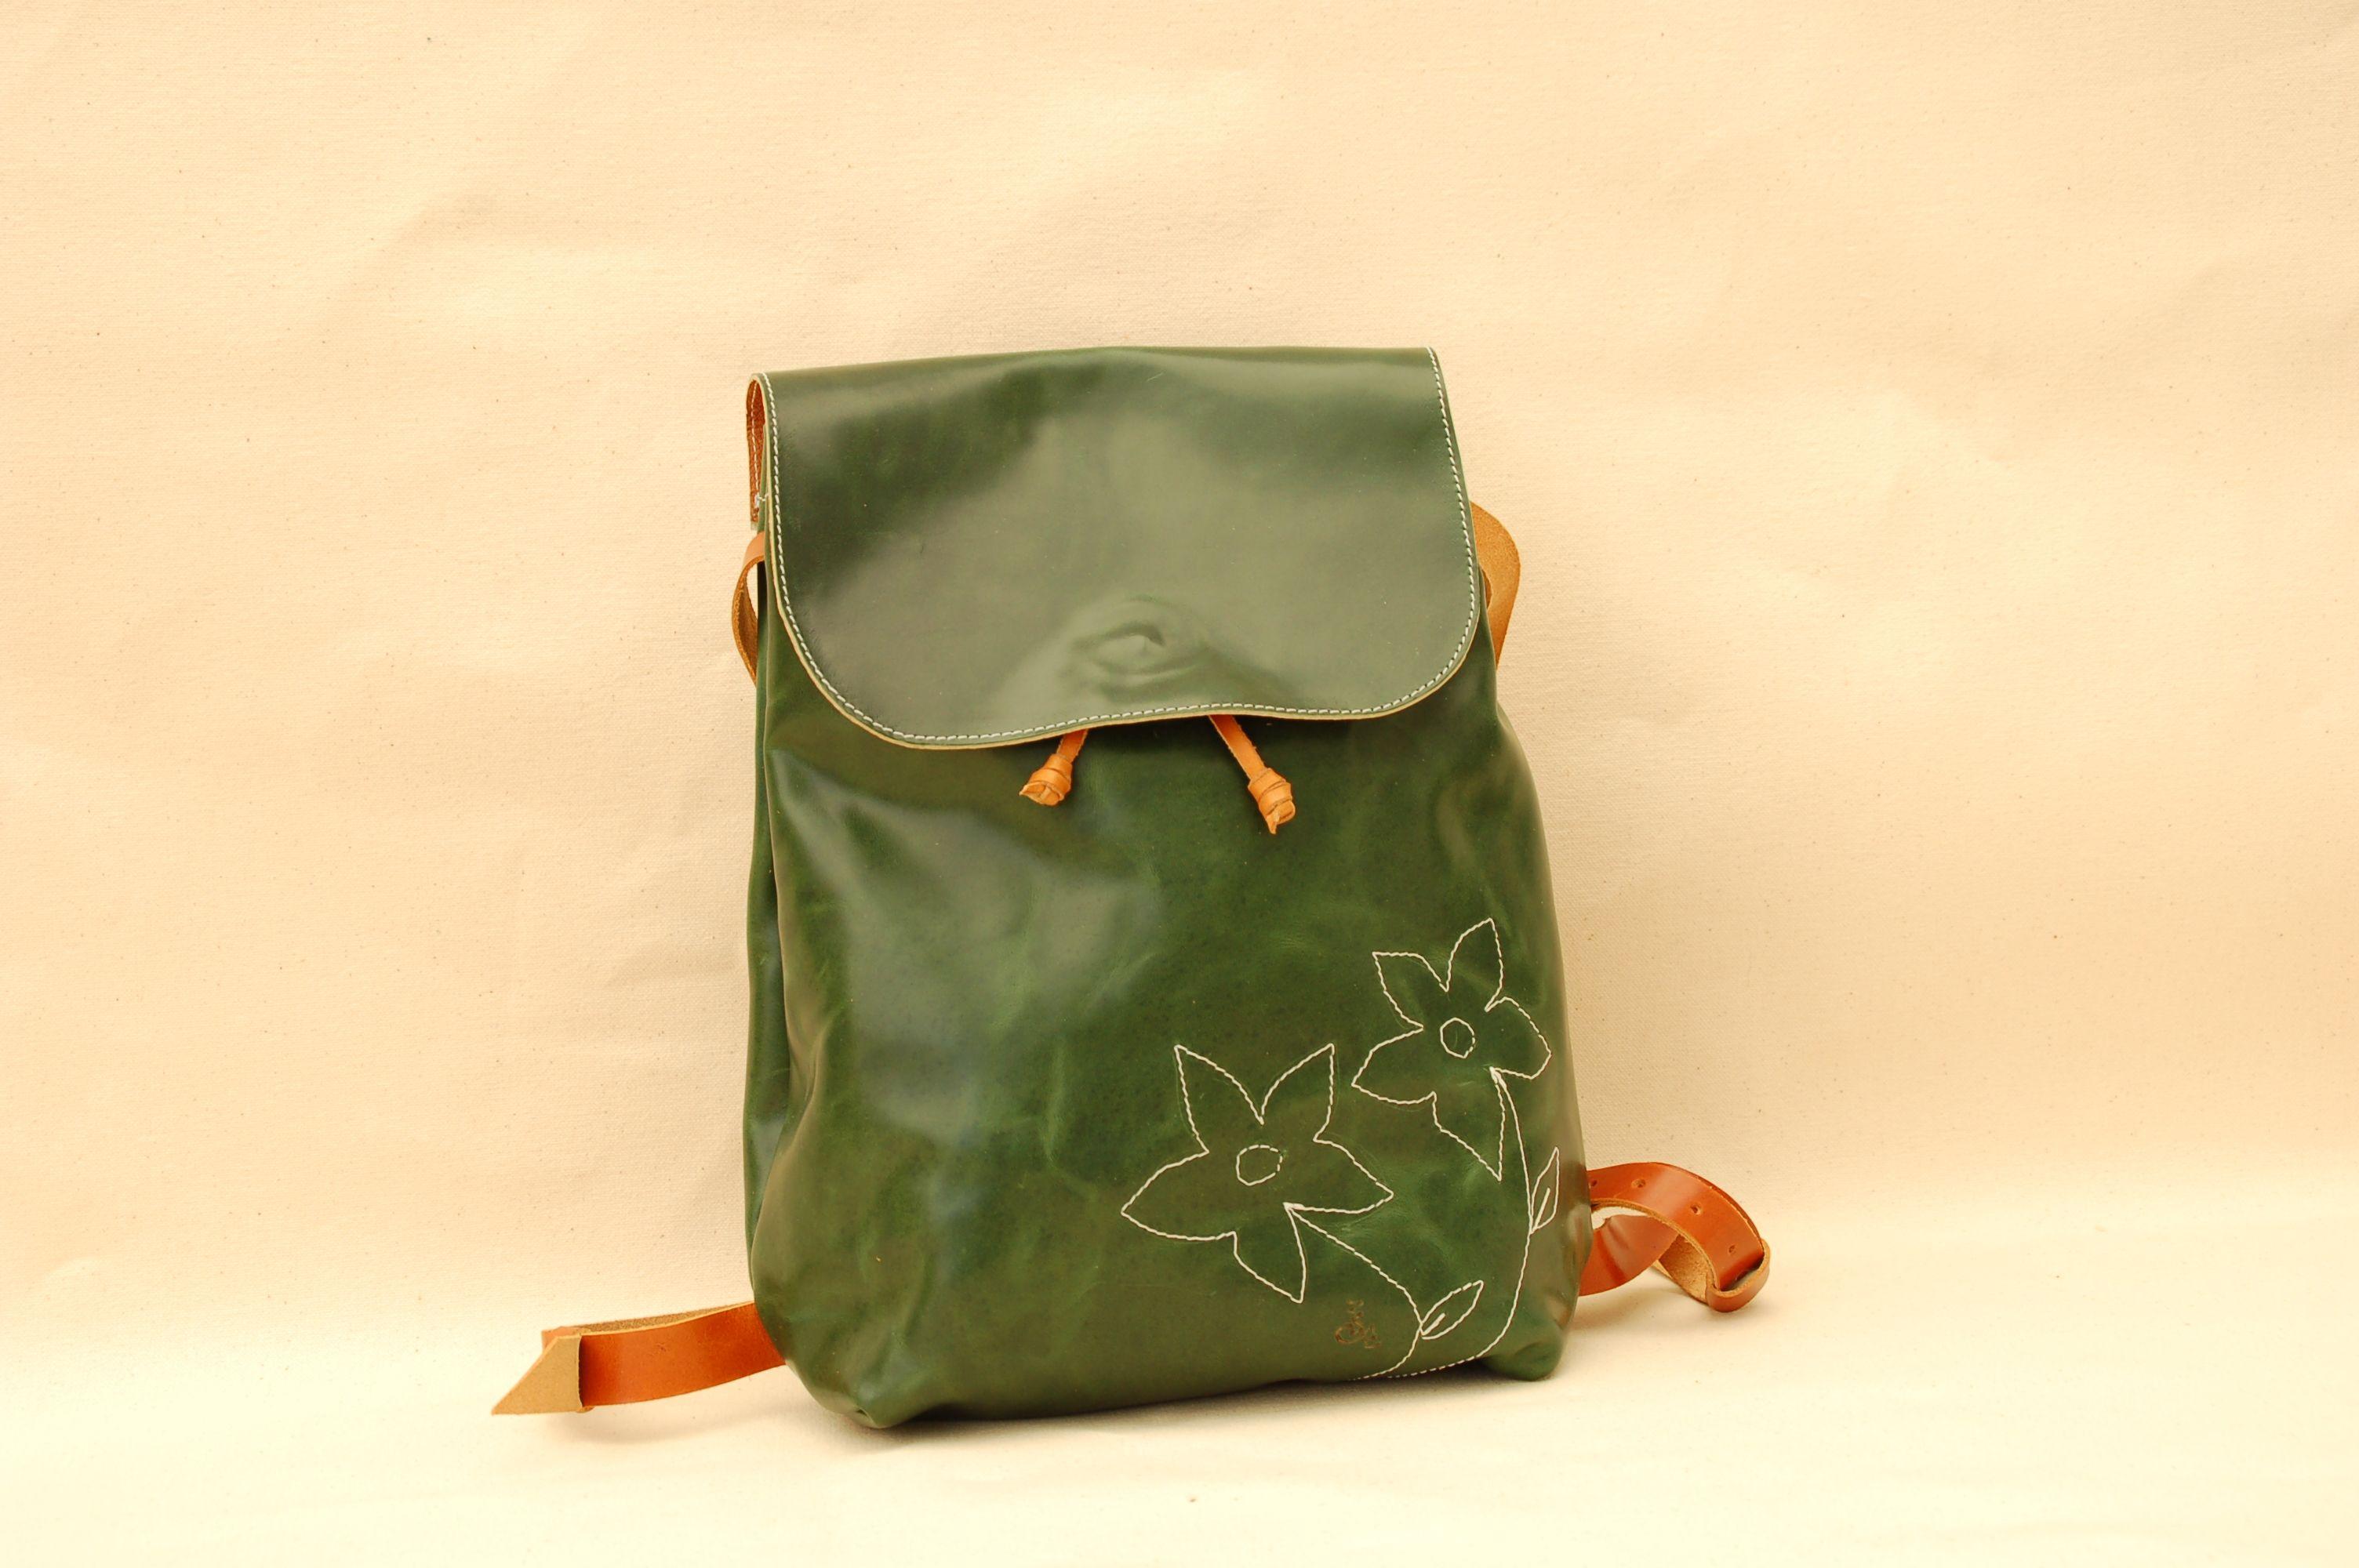 Pin de artesaniataris en mochilas  6525c496694